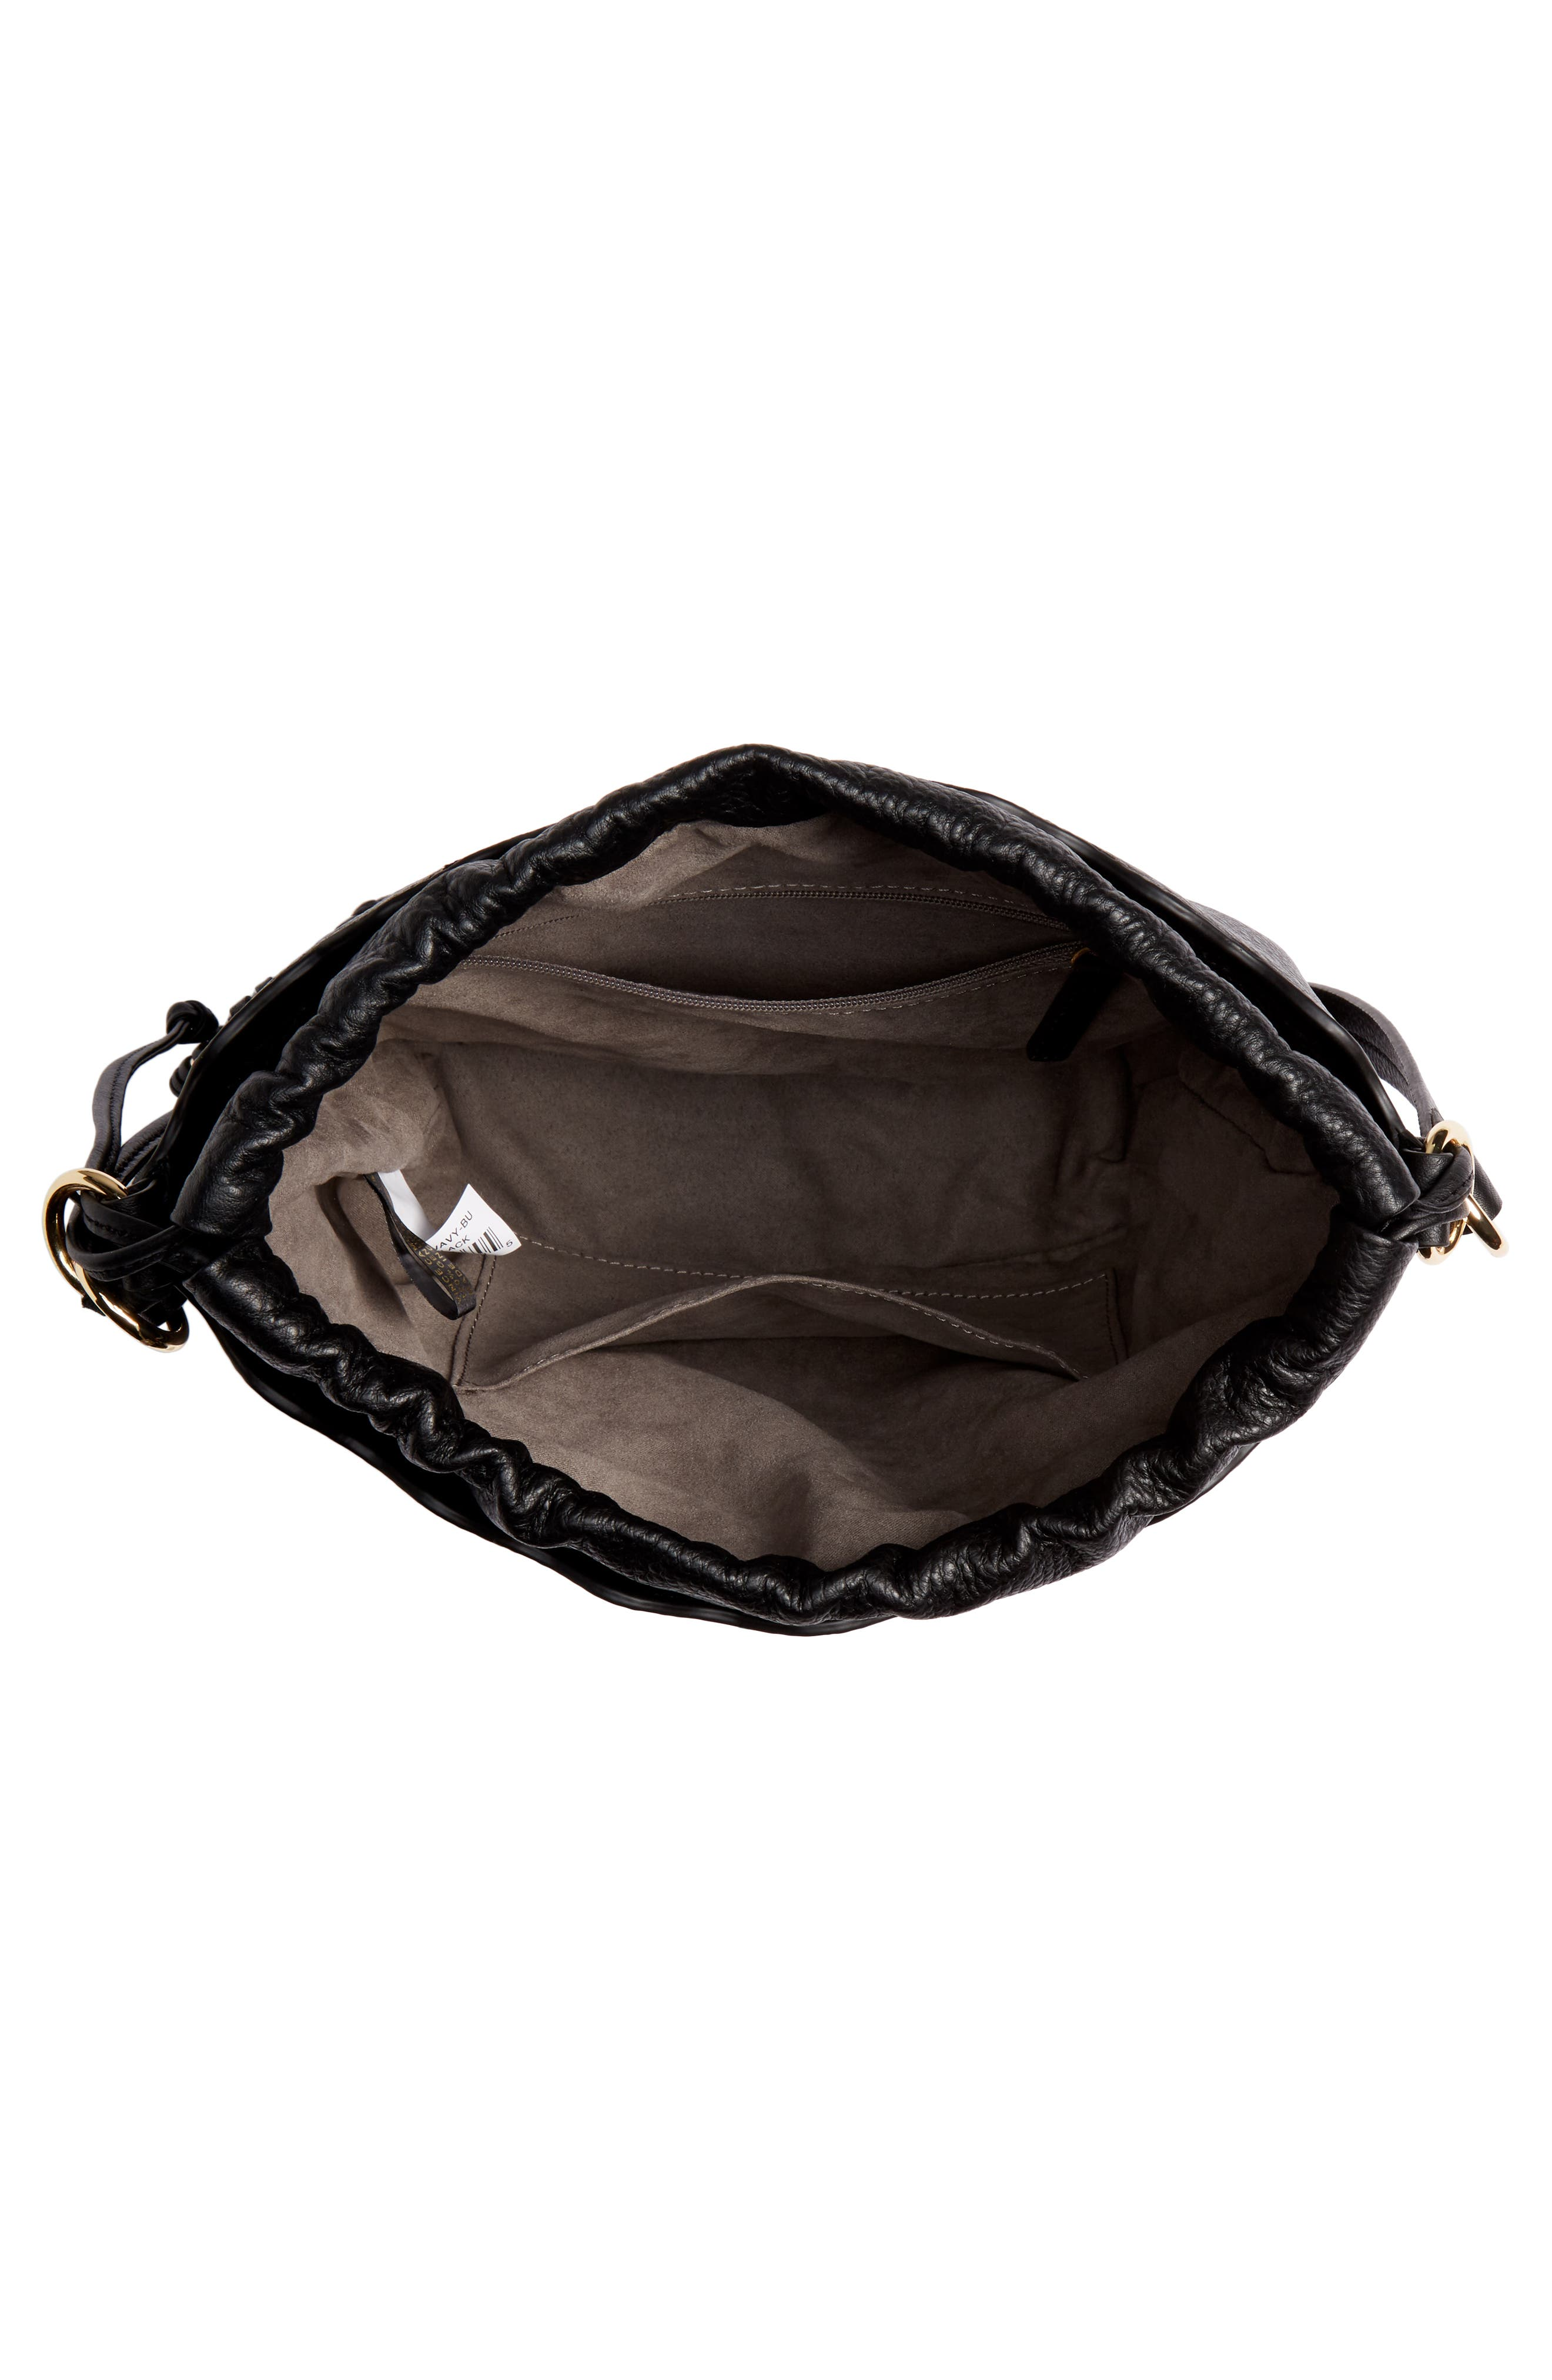 VINCE CAMUTO, Wavy Leather Bucket Bag, Alternate thumbnail 5, color, BLACK